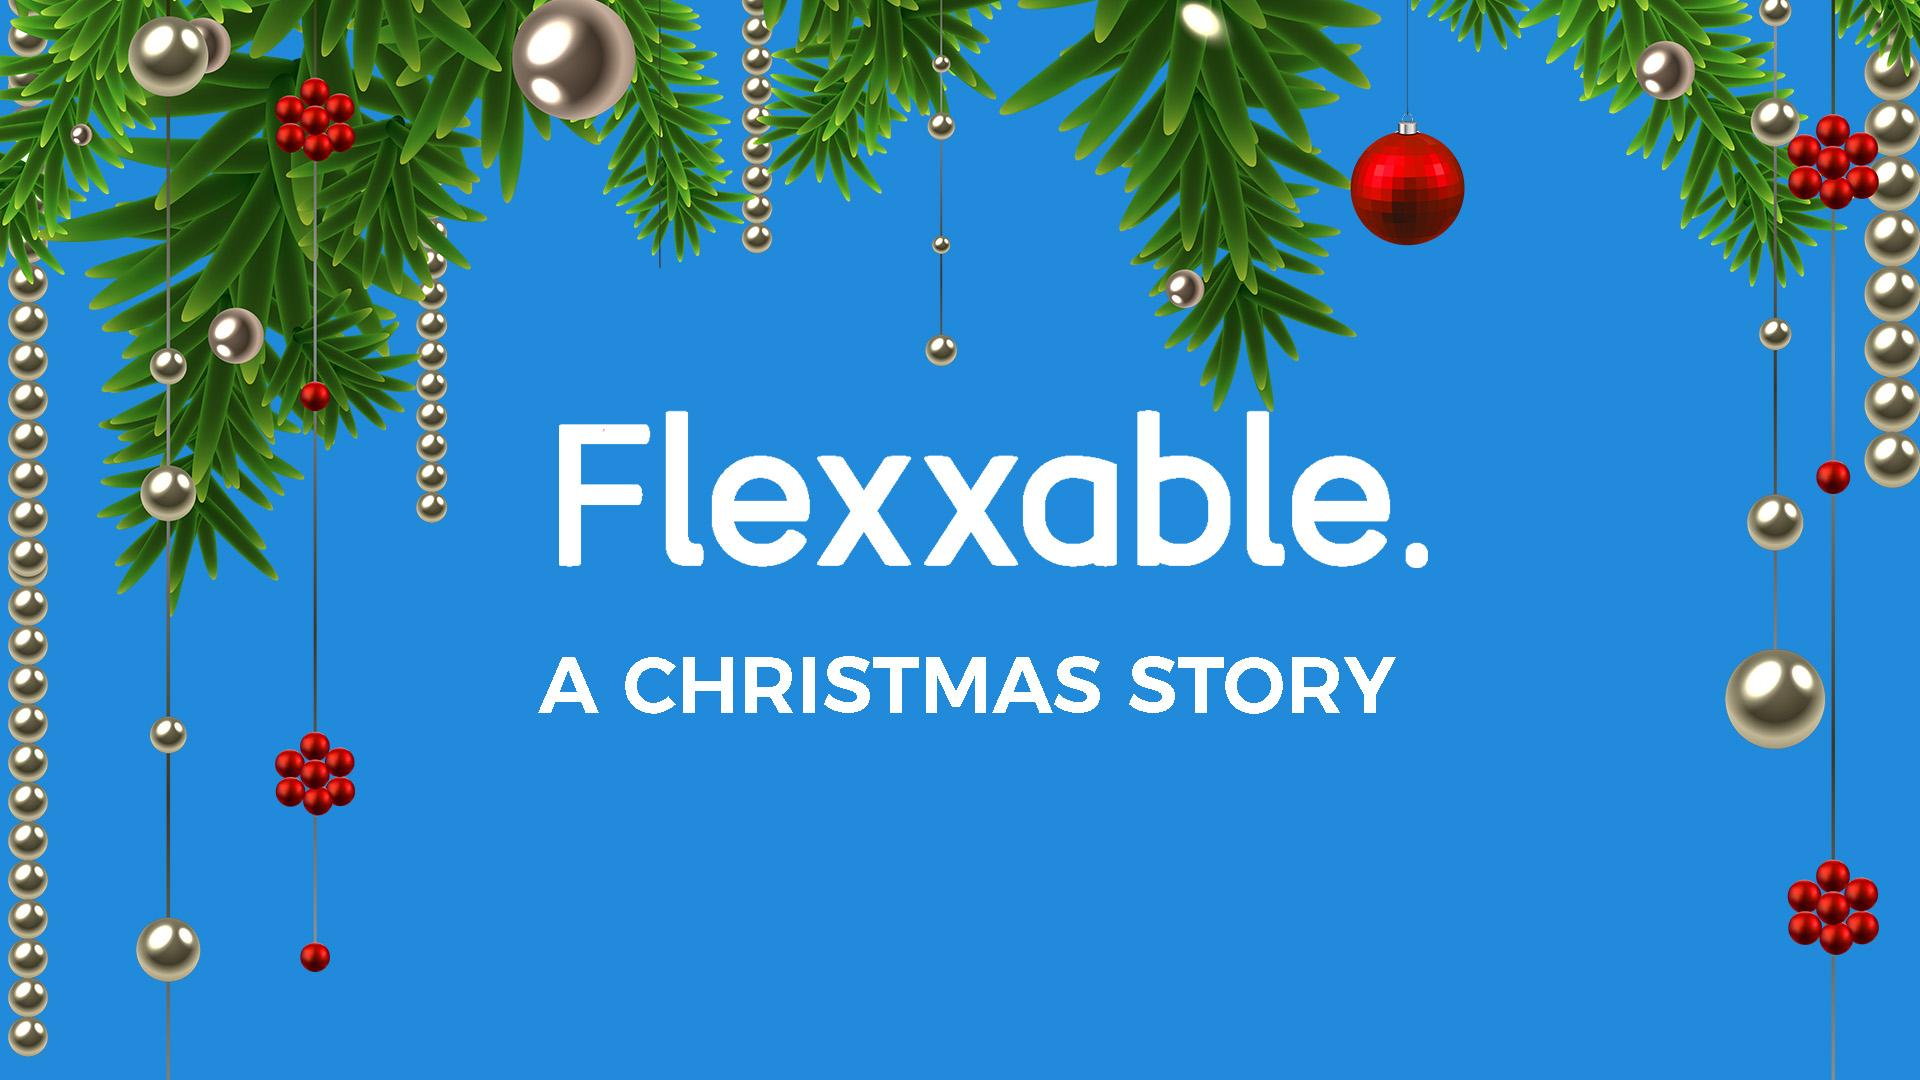 Flexxable